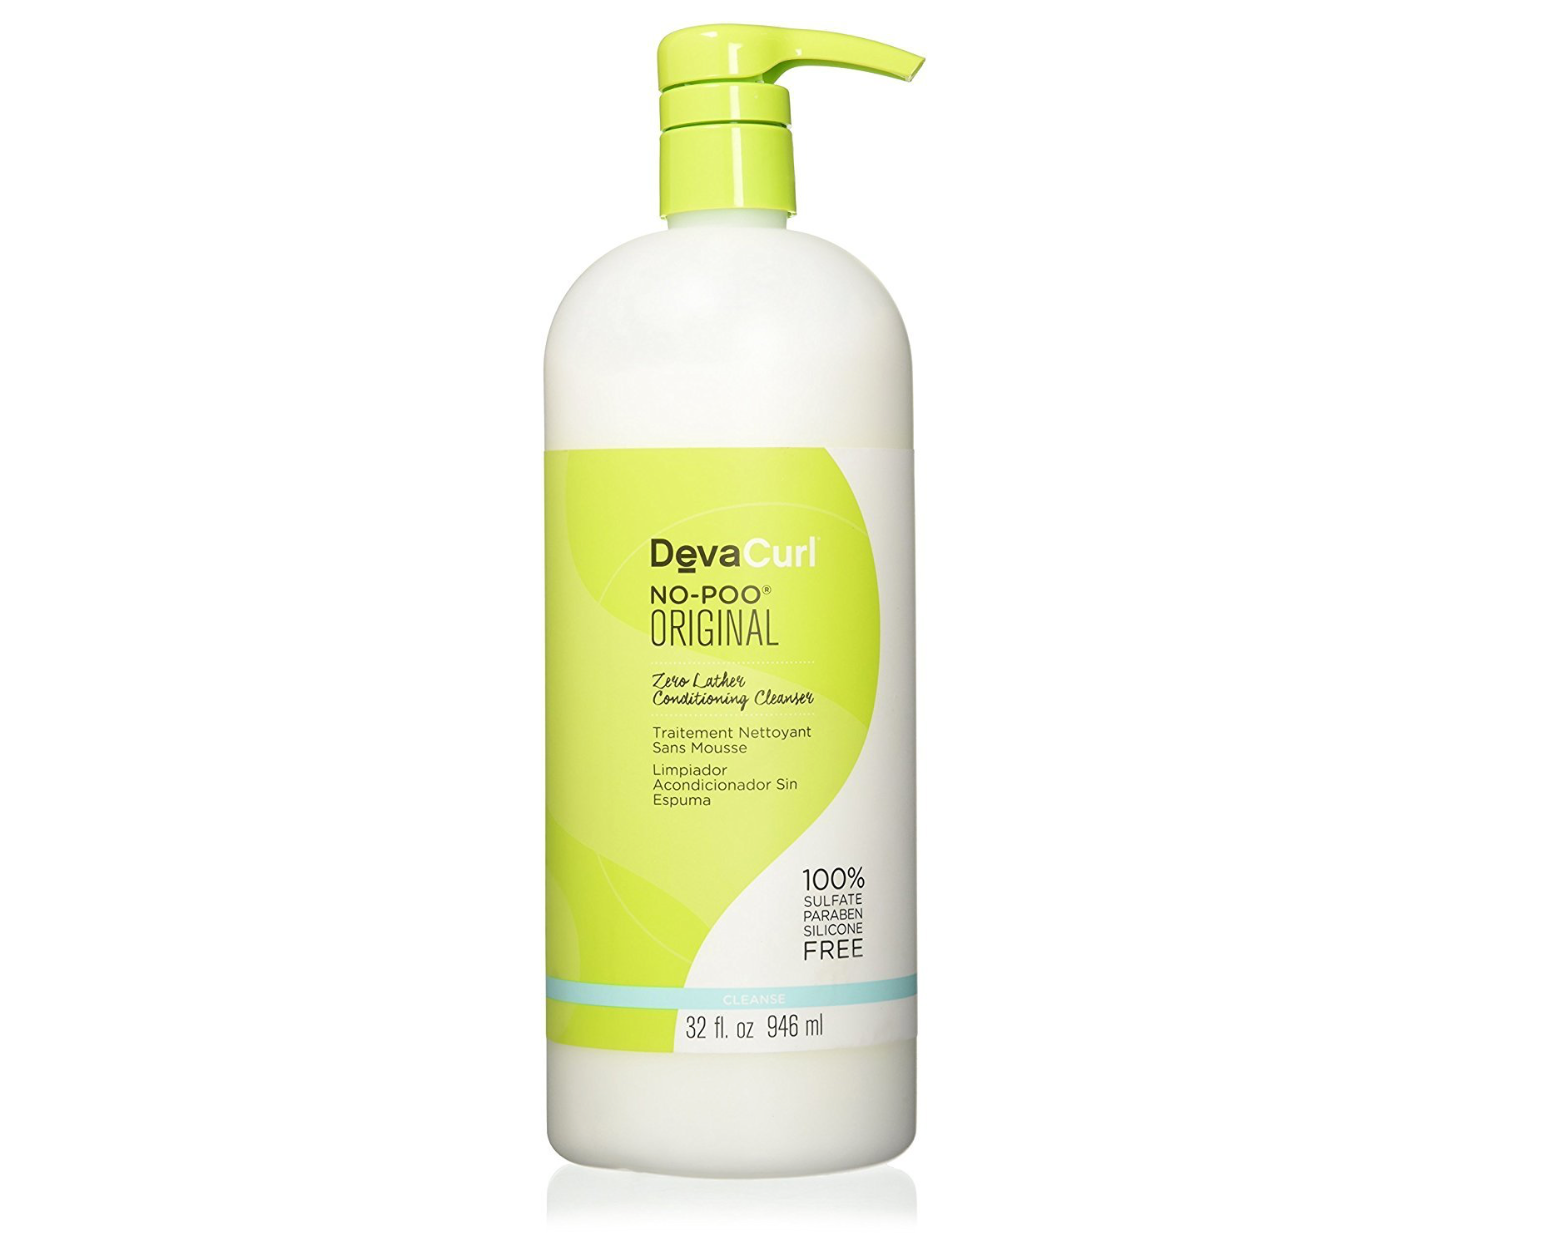 Deva Curl No-Poo Conditioning Cleanser